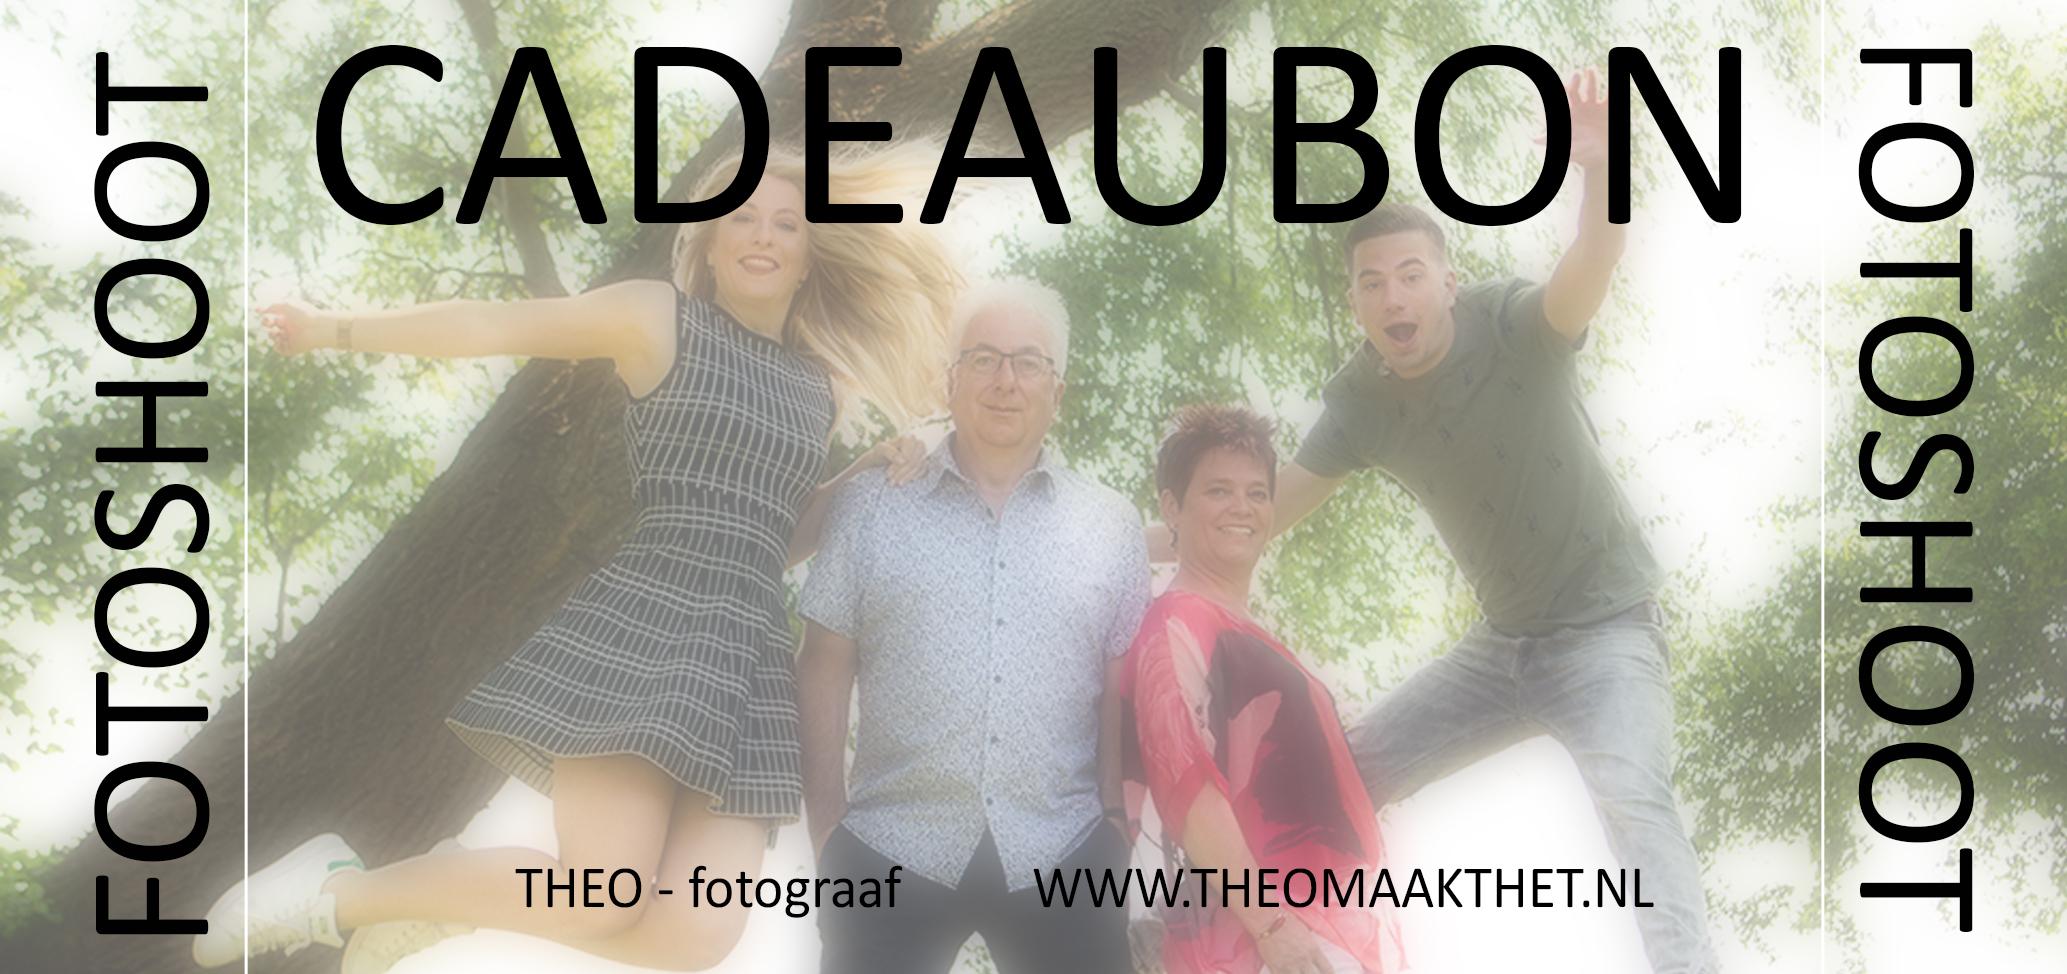 FOTOSHOOT CADEAUBON